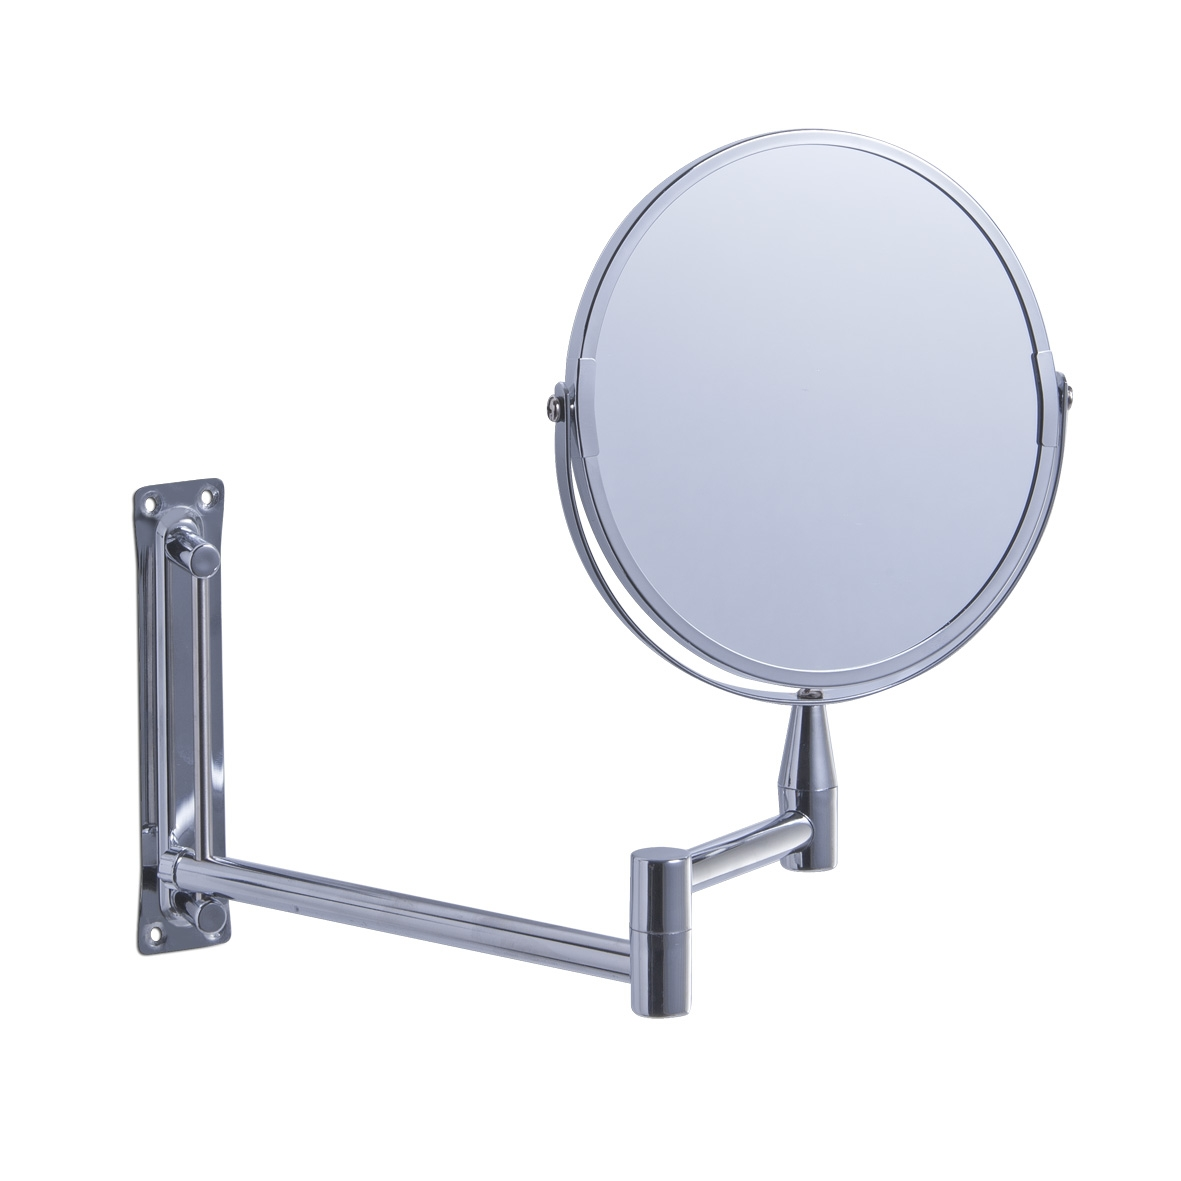 Oglinda cosmetica de perete extensibila Metal Cromat O 17xl215/315xH325 cm